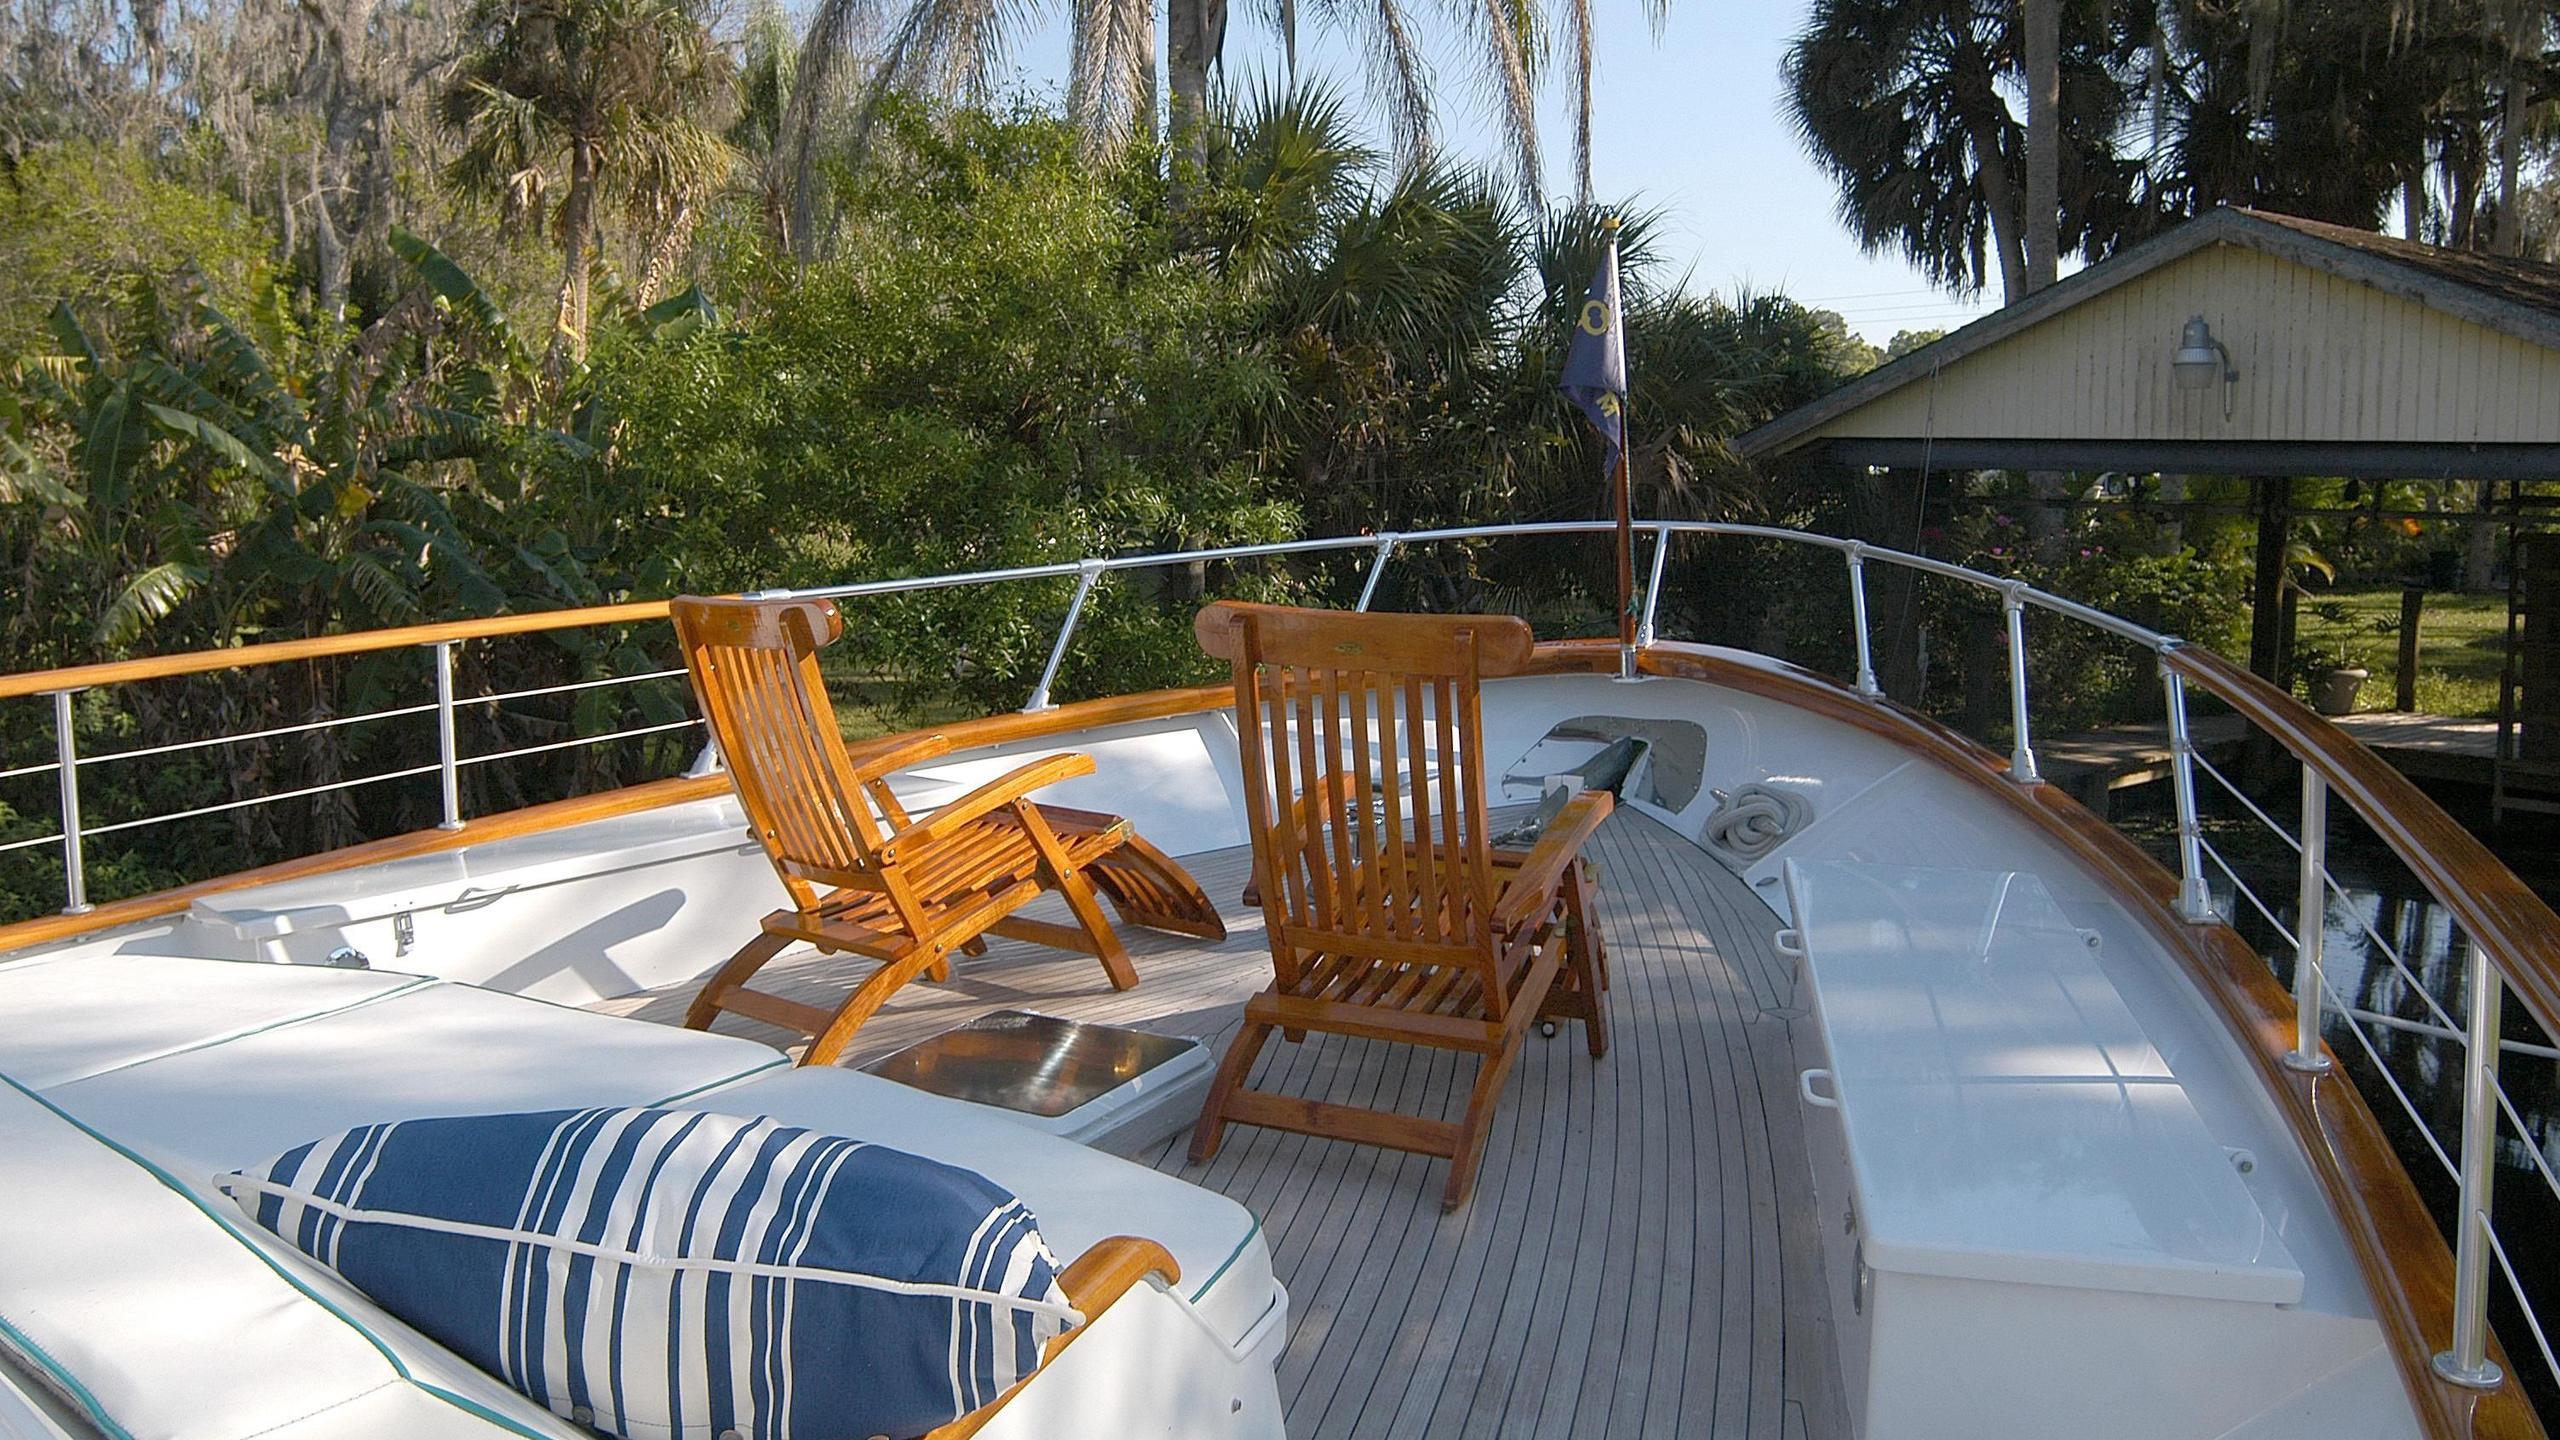 capricho-yacht-sun-deck